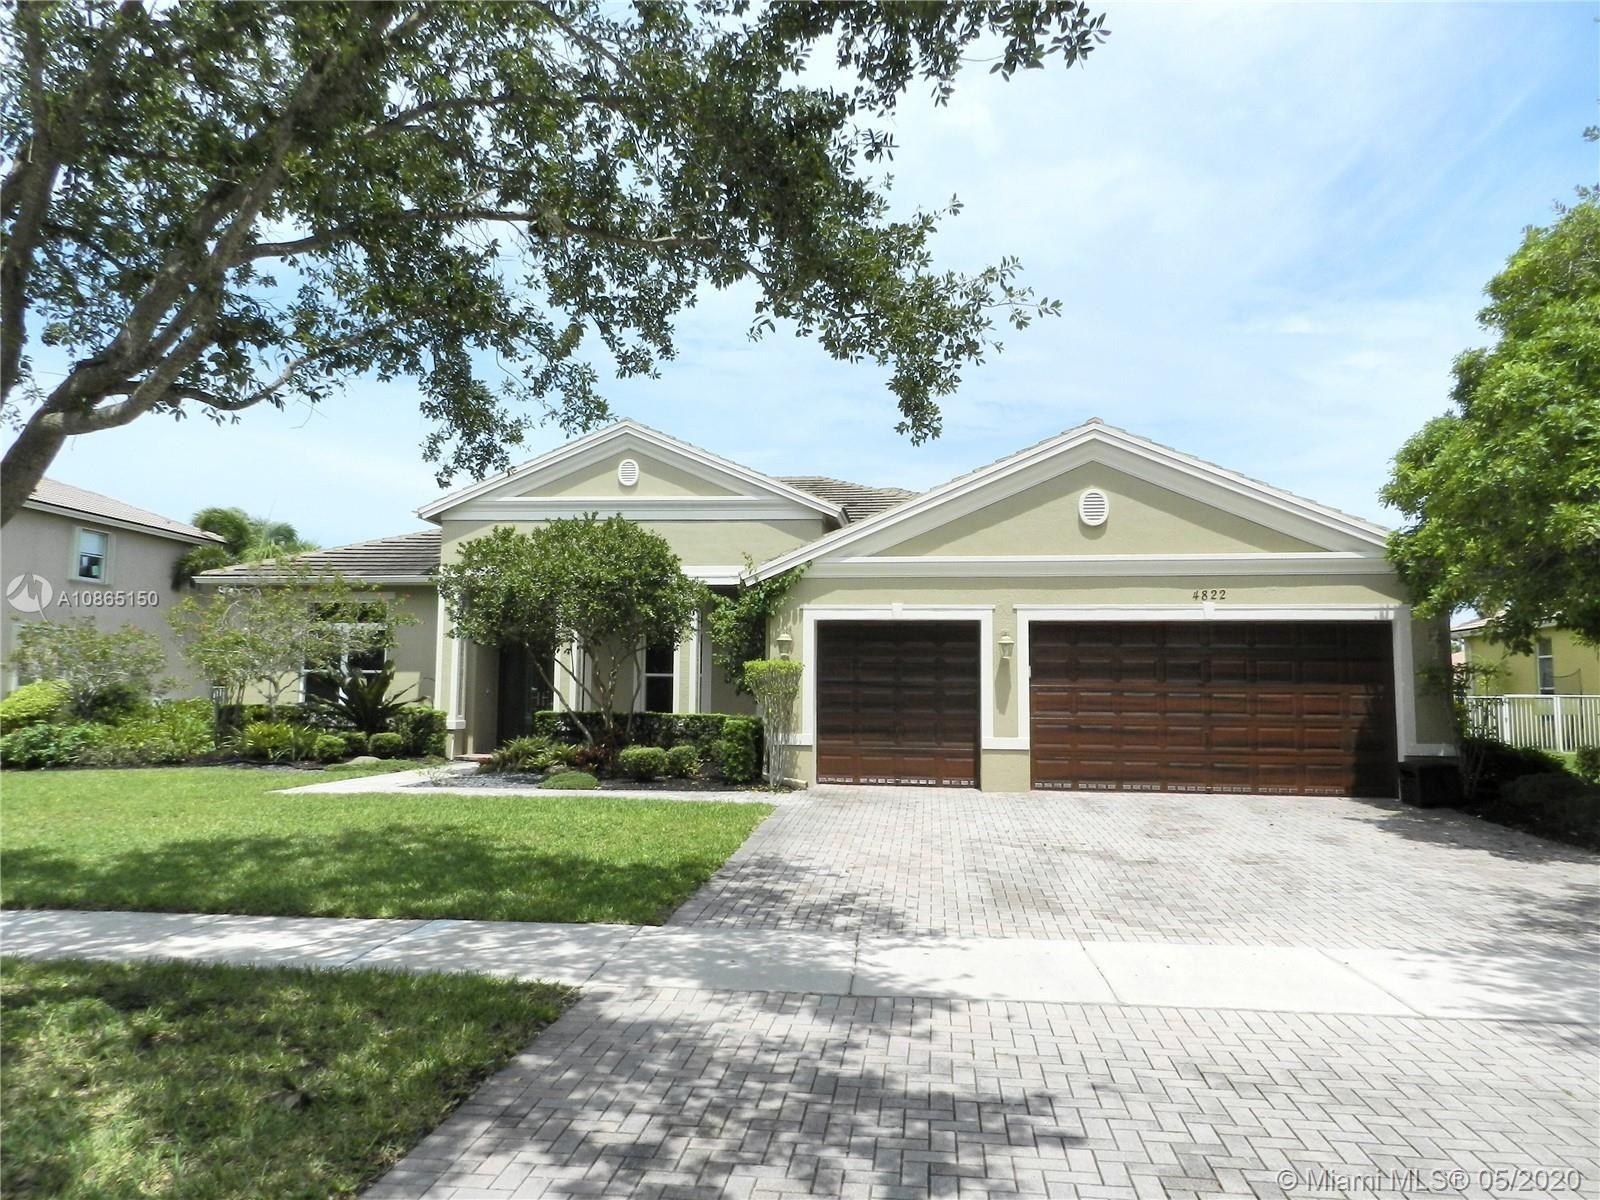 4822 Hibbs Grove Ter, Cooper City, FL 33330 - #: A10865150